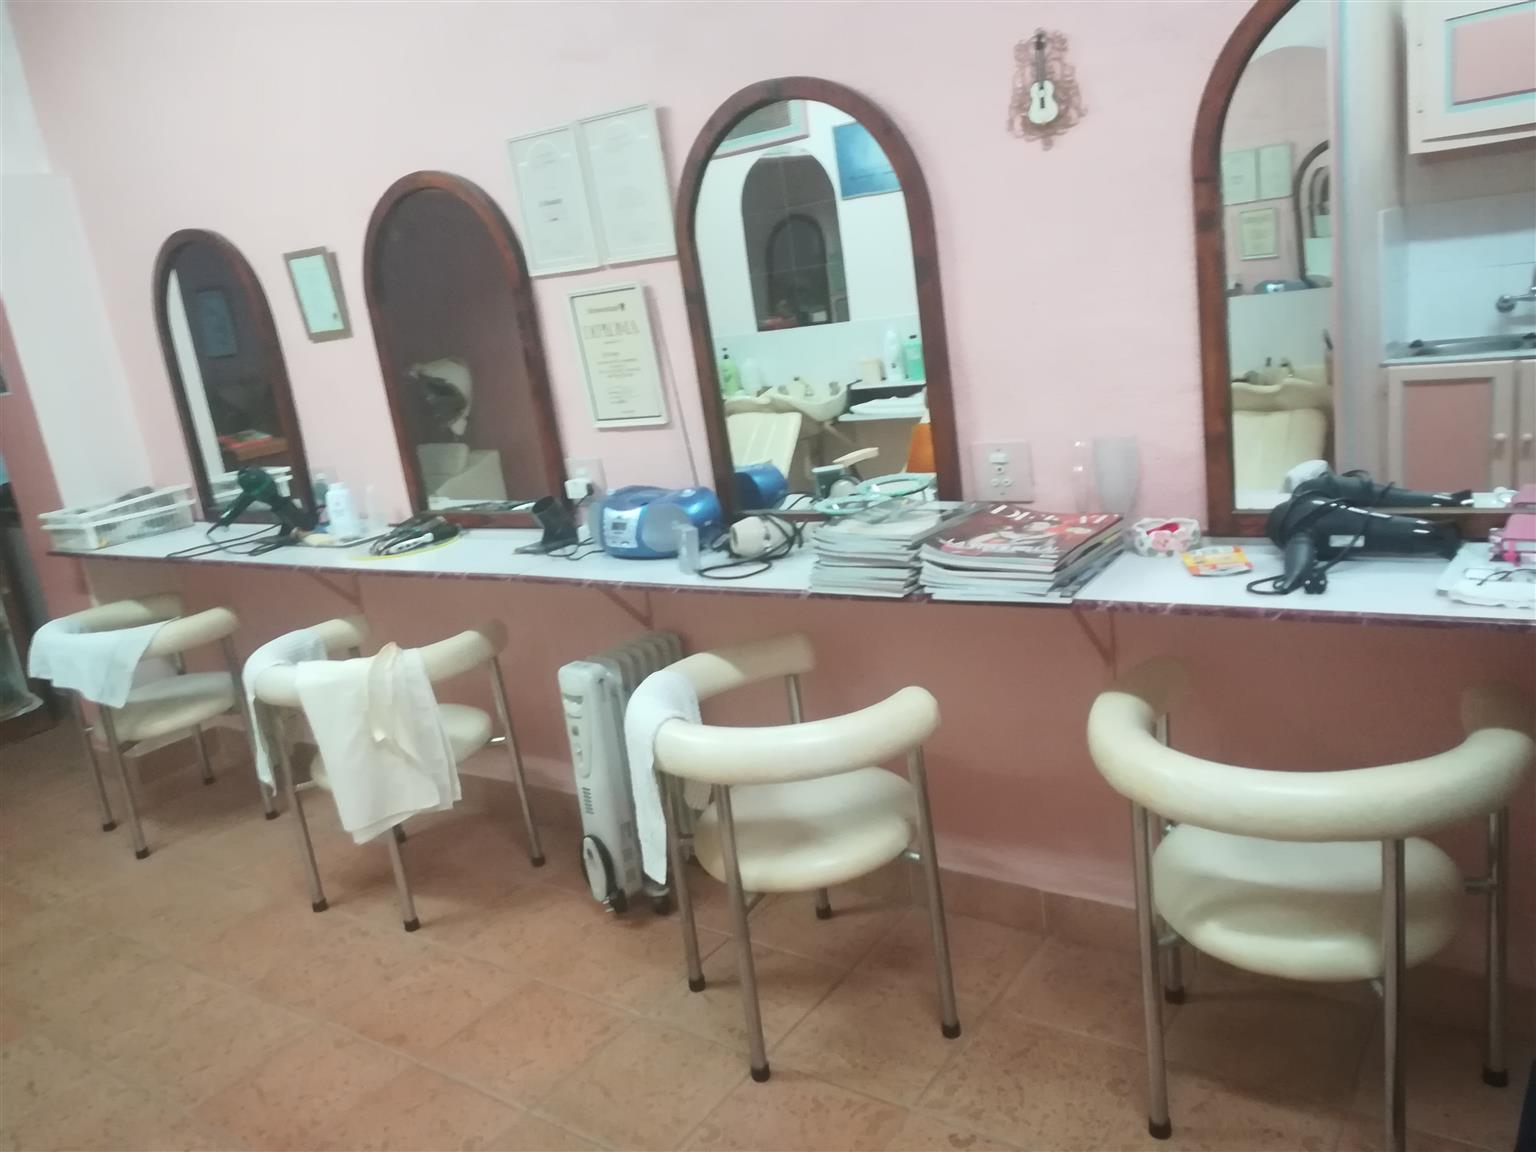 Hair Salon Equiptment and furniture